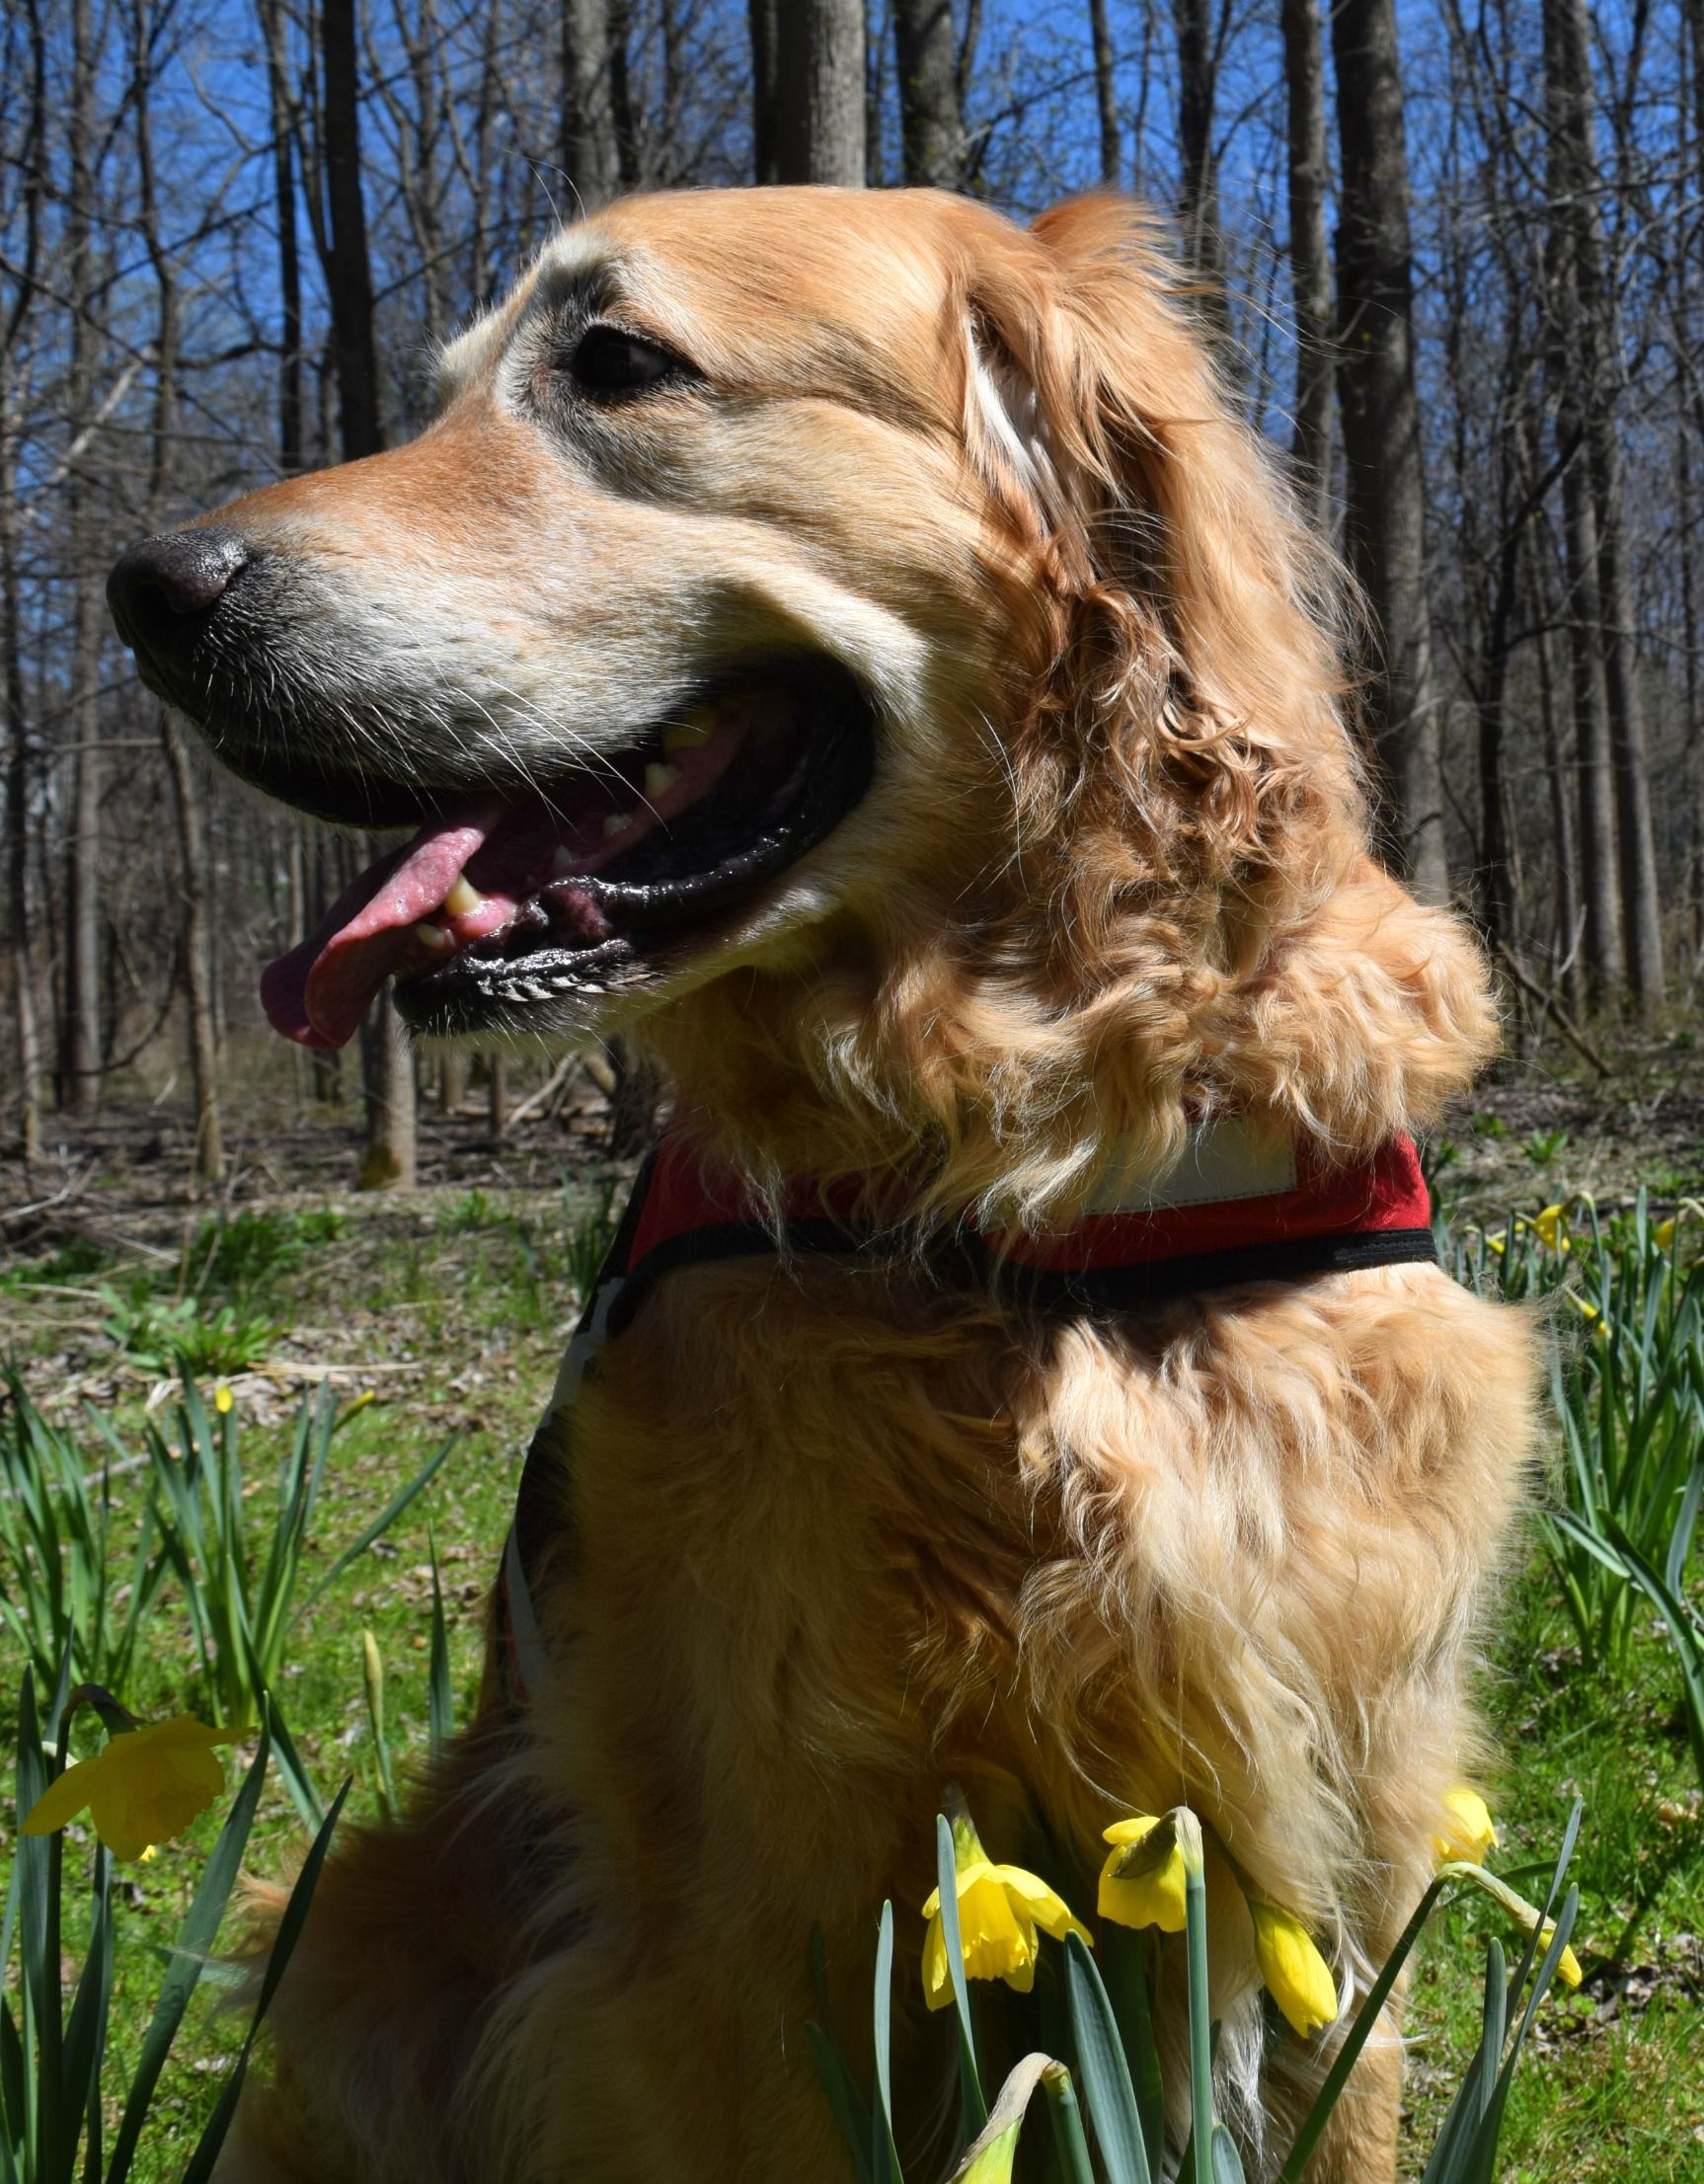 Hiking The Daffodil Trail At Powder Mills Park Mill Park Hiking Dogs Daffodils